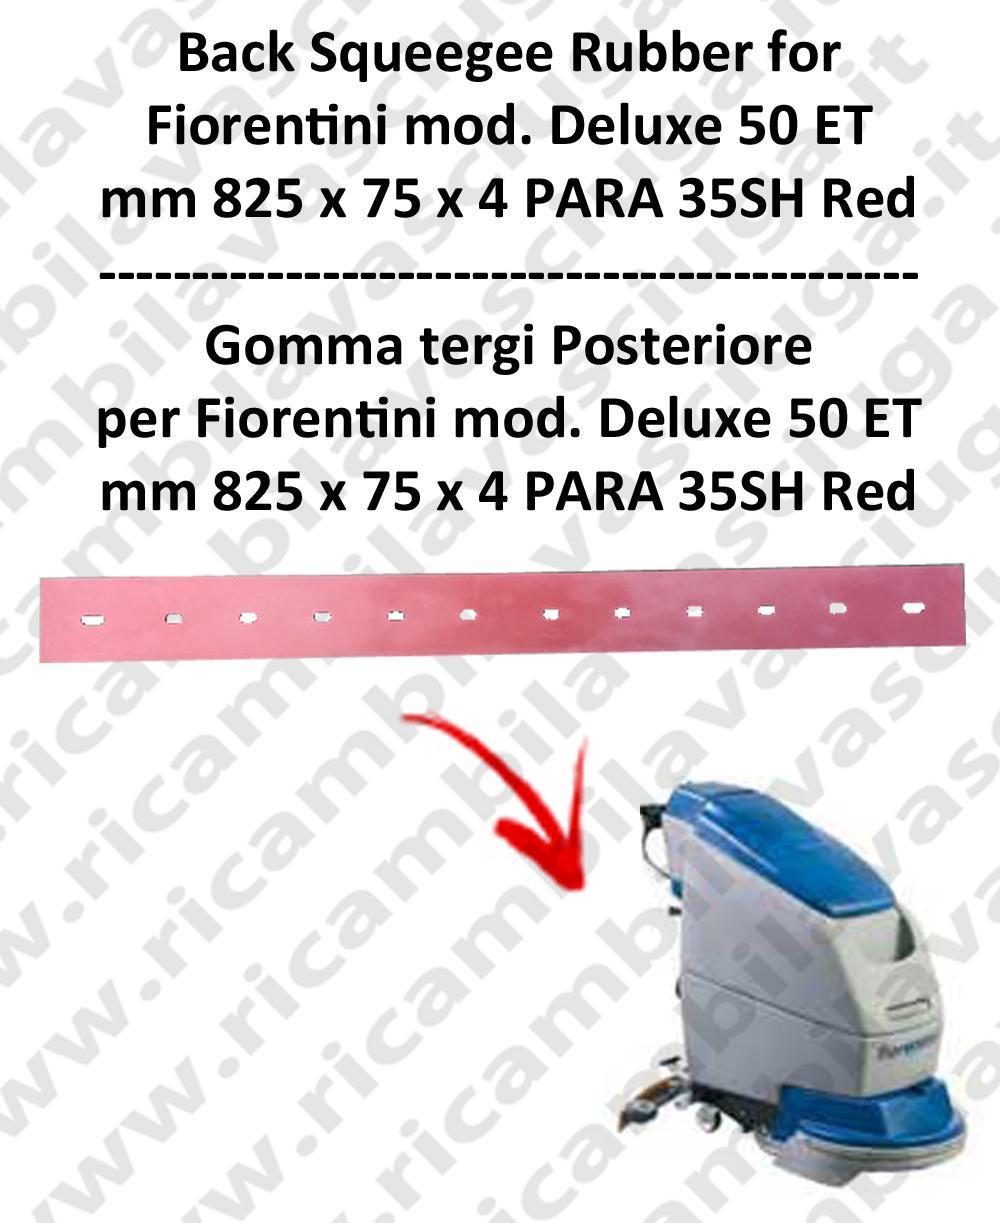 DELUX 50 ET new type Bavette ARRIERE pour autolaveuses  FIORENTINI